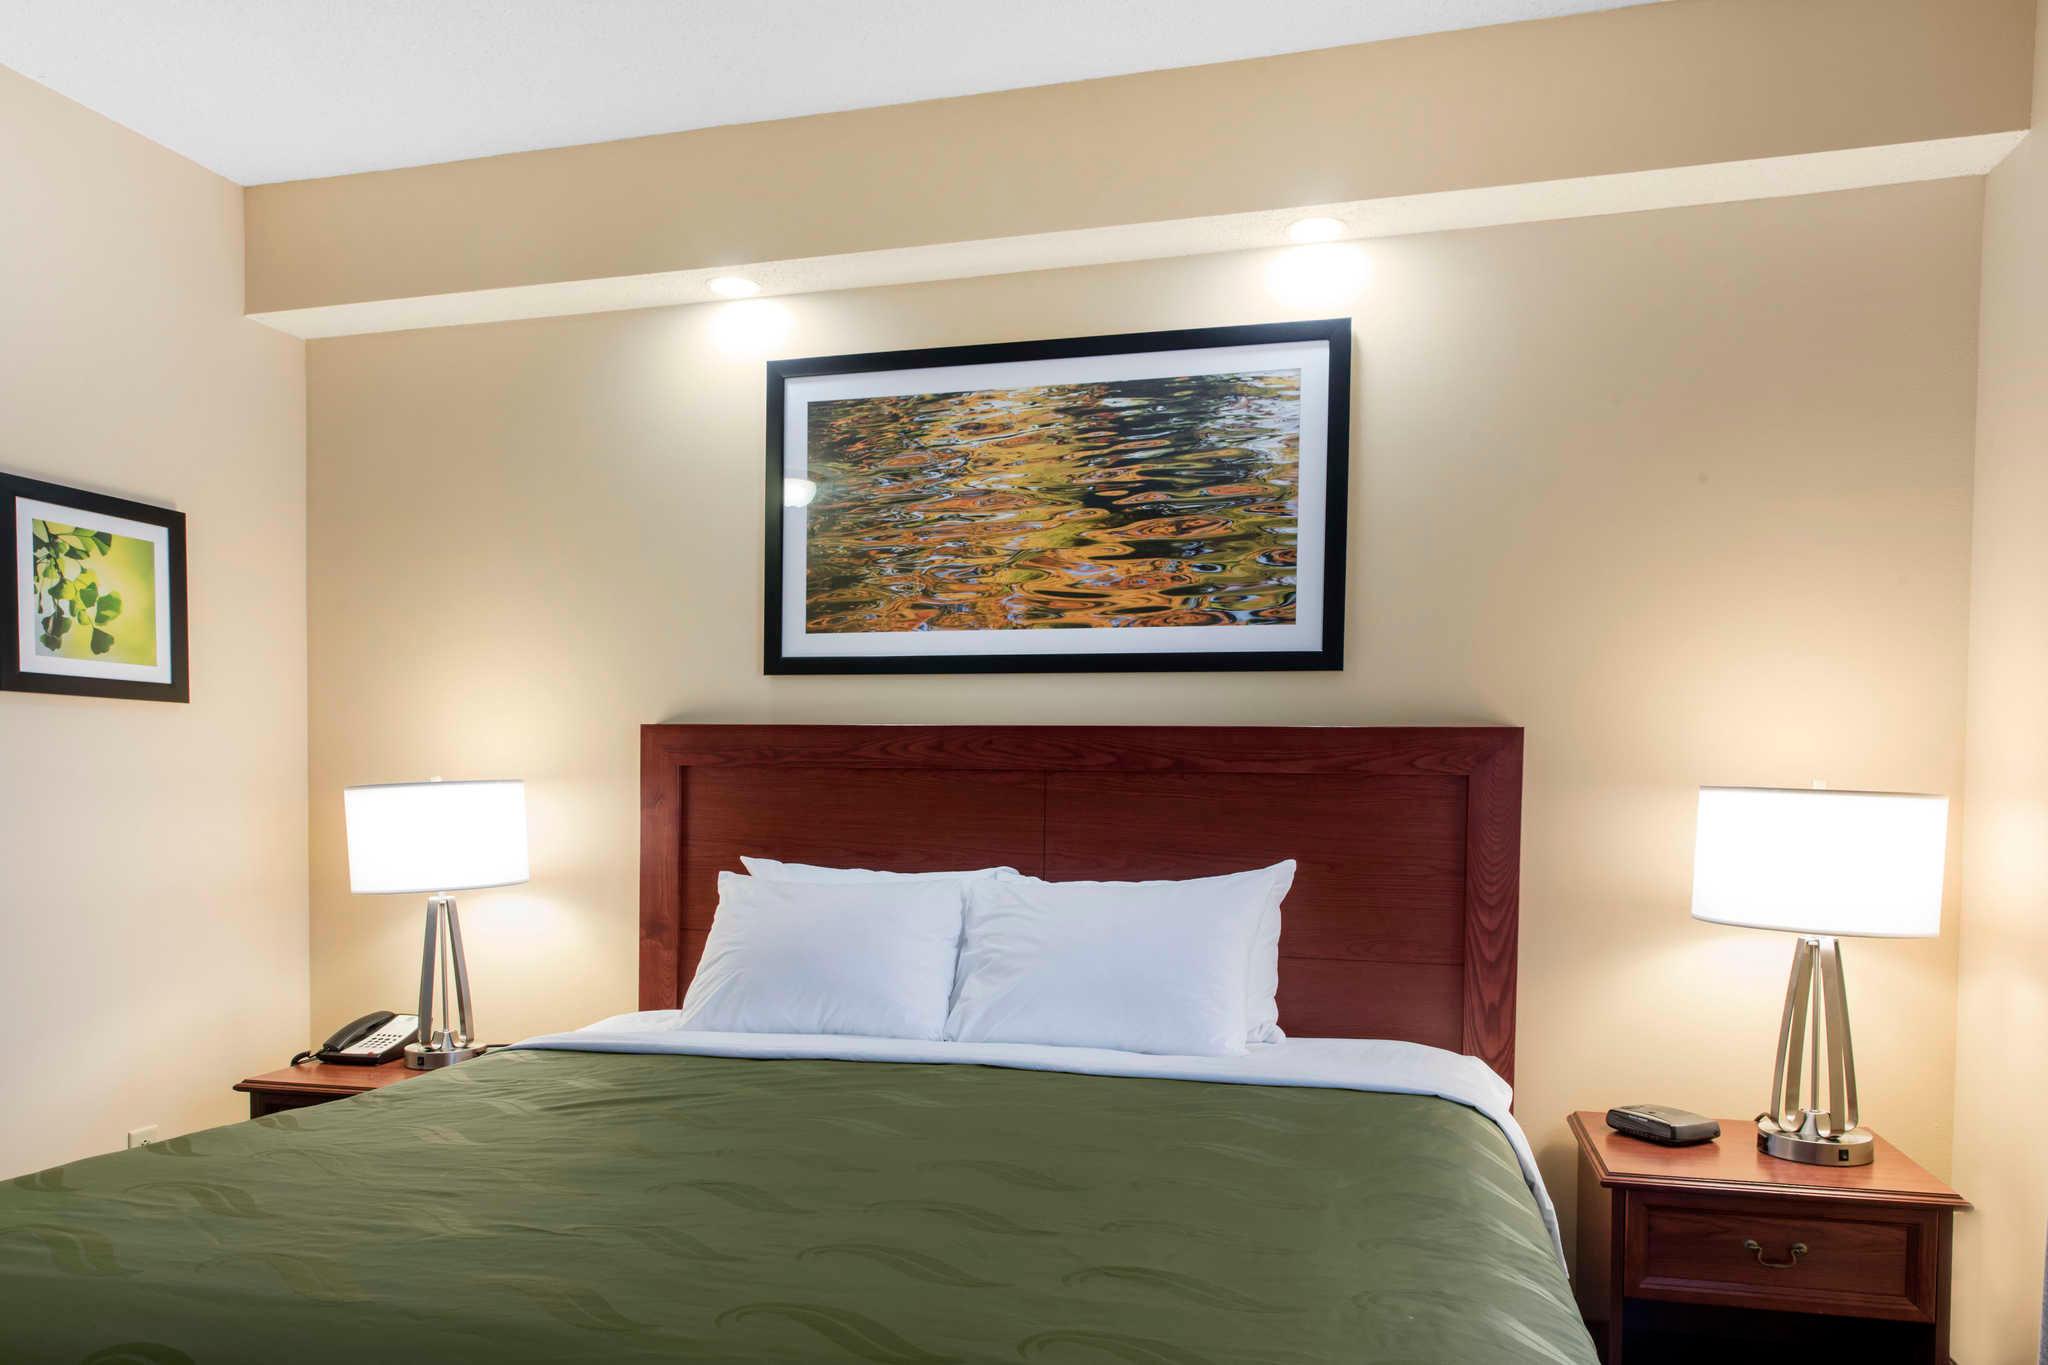 Quality Inn image 21